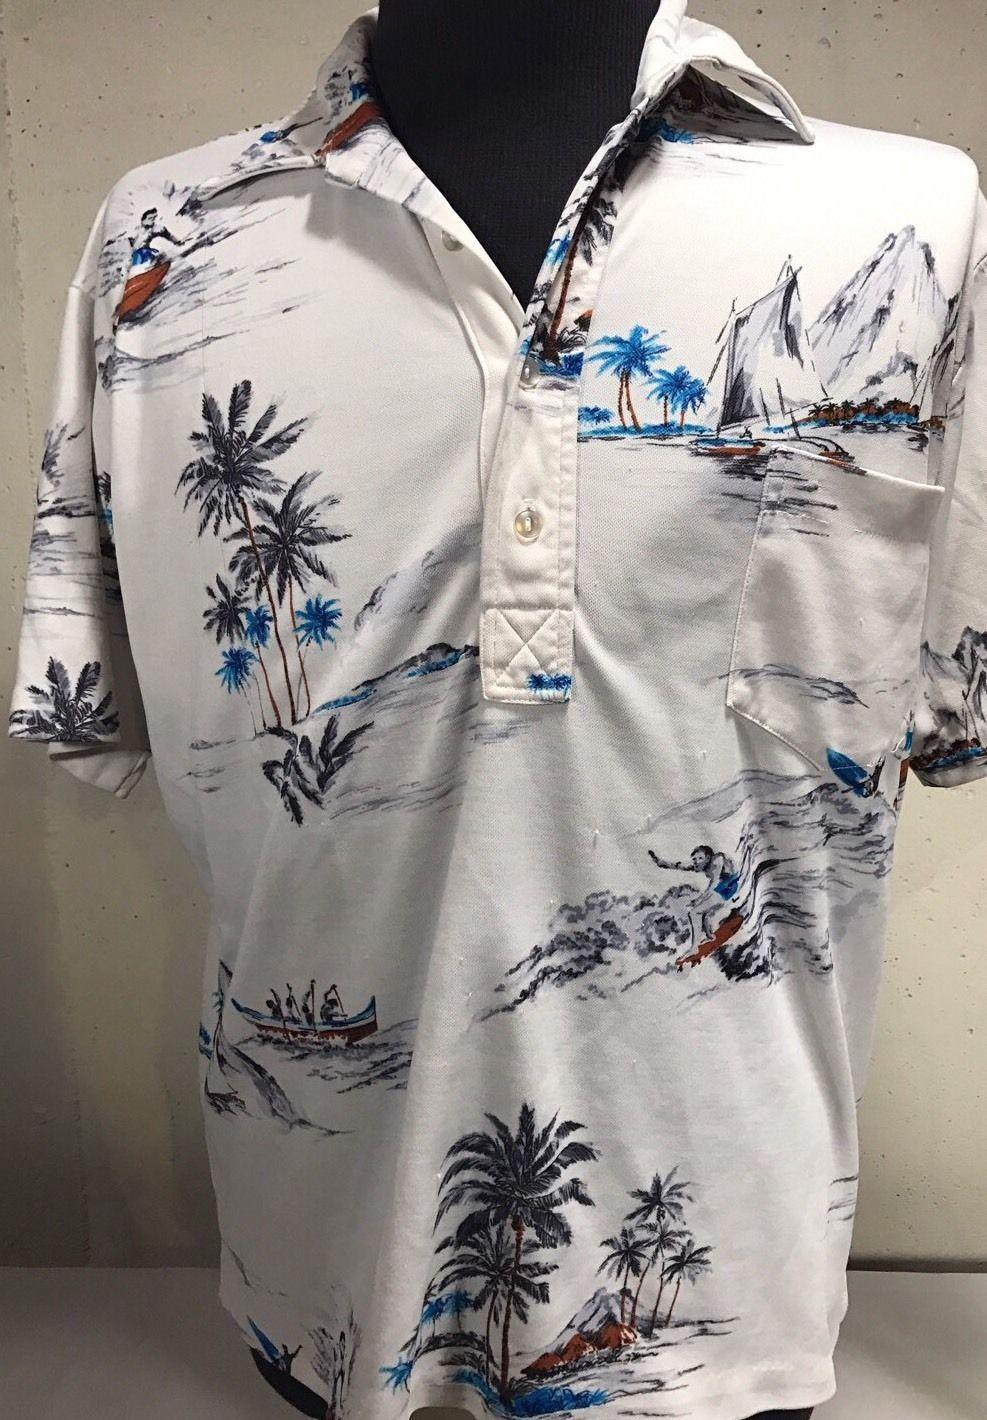 e6f5f6cd RJC Hawaiian White Shirt Sleeve Shirt No and 43 similar items. S l1600